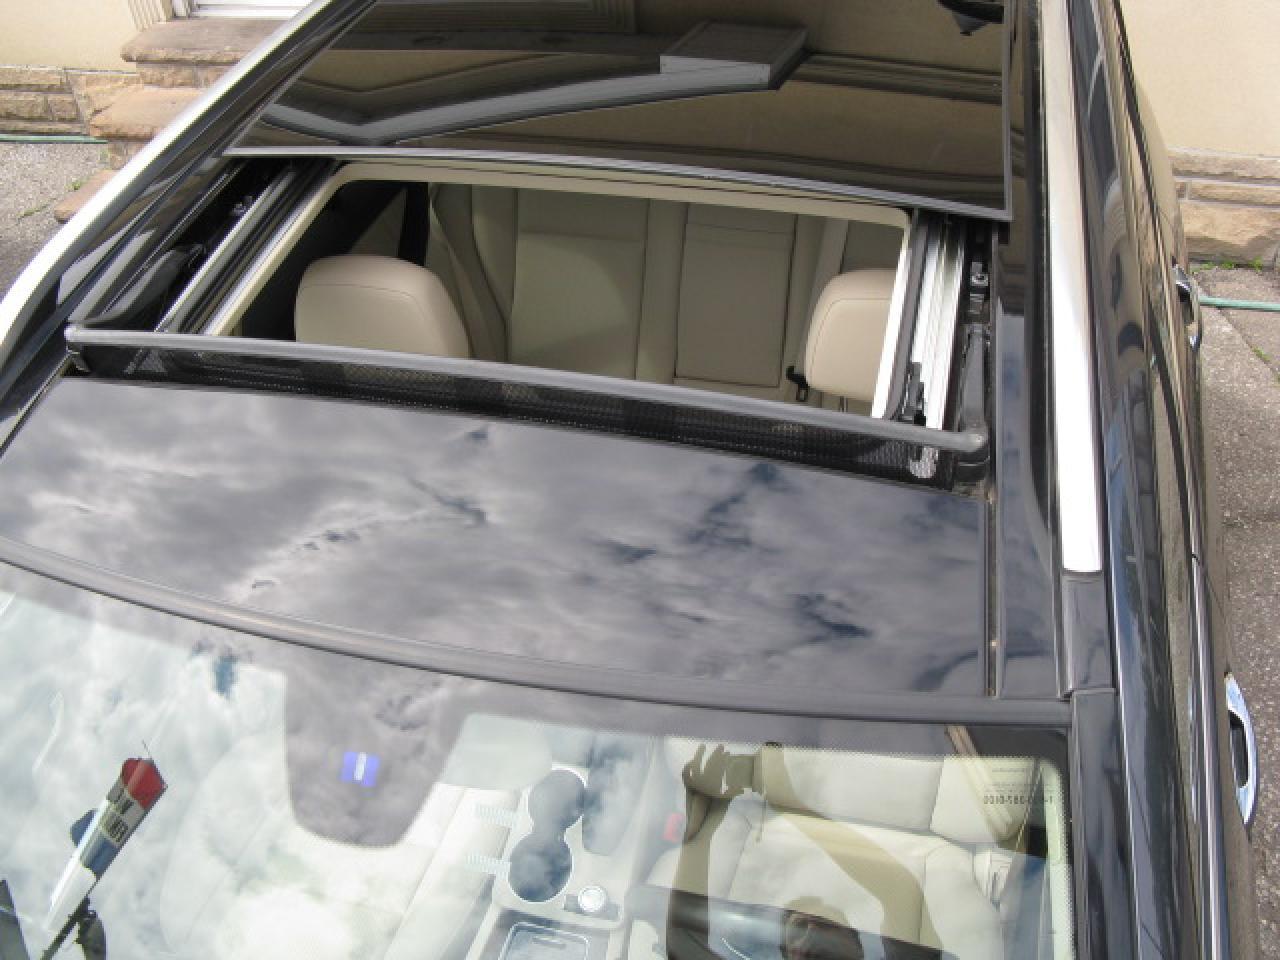 2015 Mercedes-Benz GLK 250 BLUETEC 4MATIC AVANTGARDE PLUS EDITION